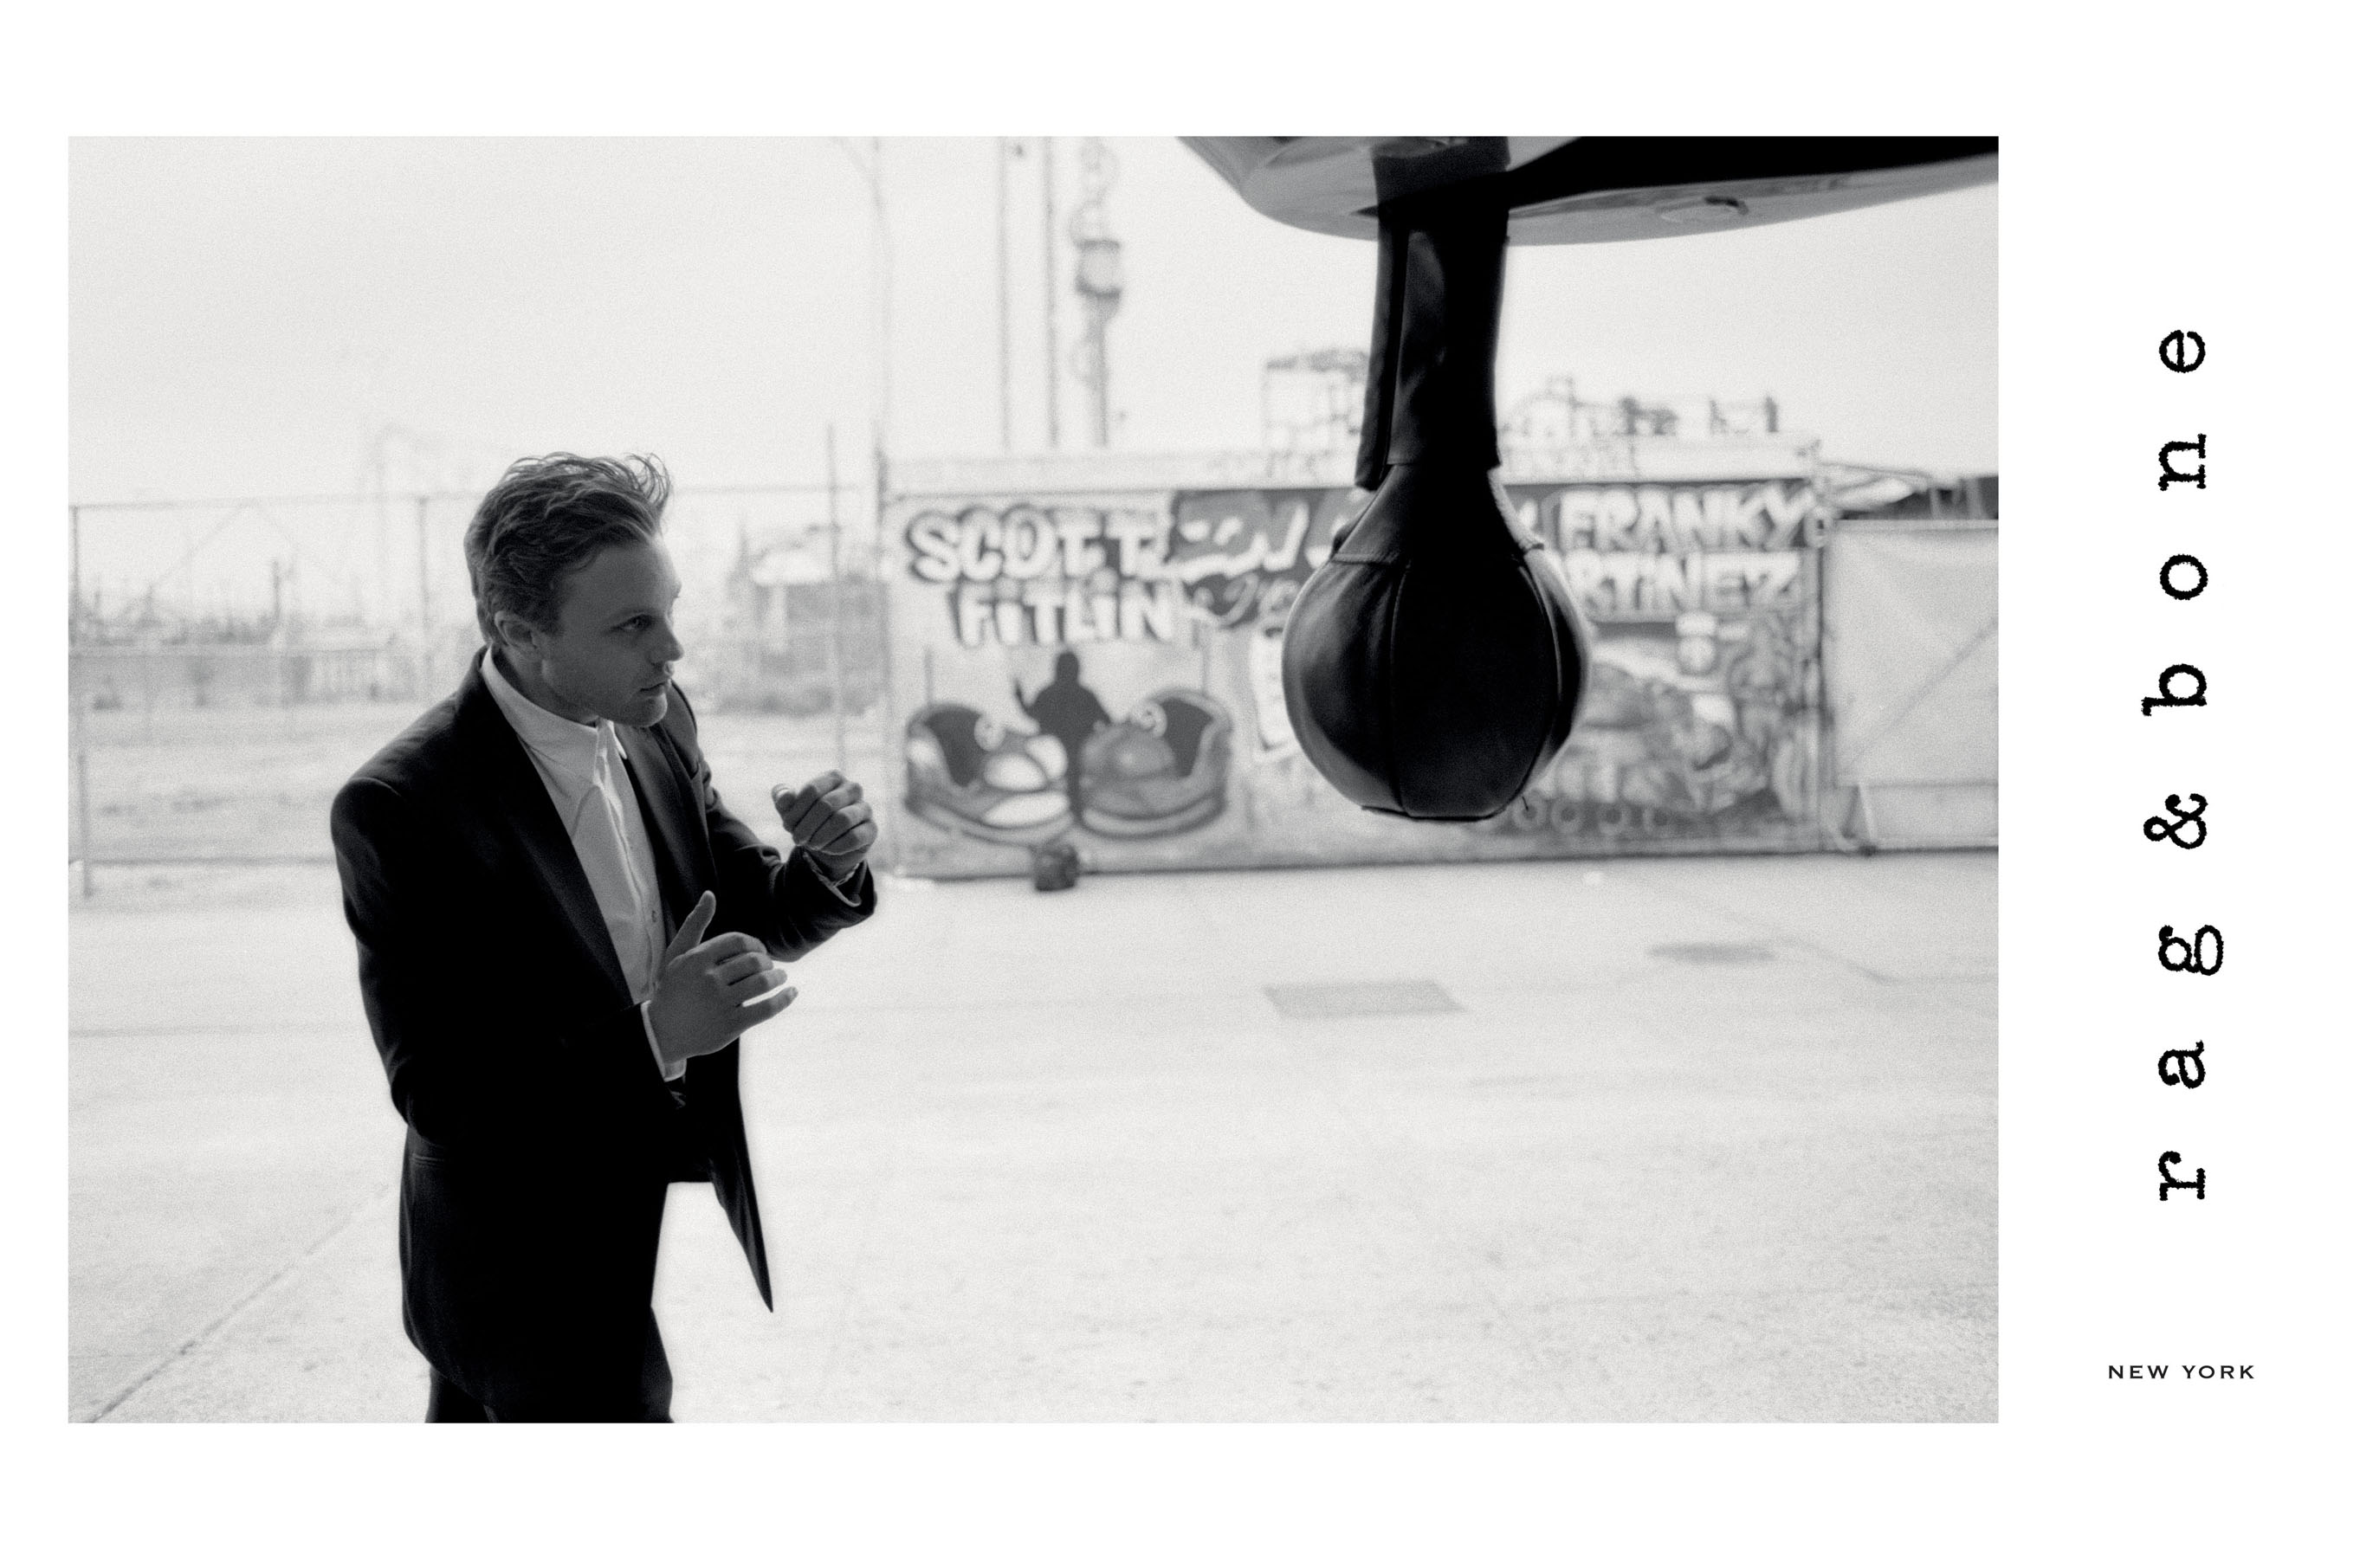 First Look: Michael Pitt for Rag & Bone Fall/Winter 2014 Campaign